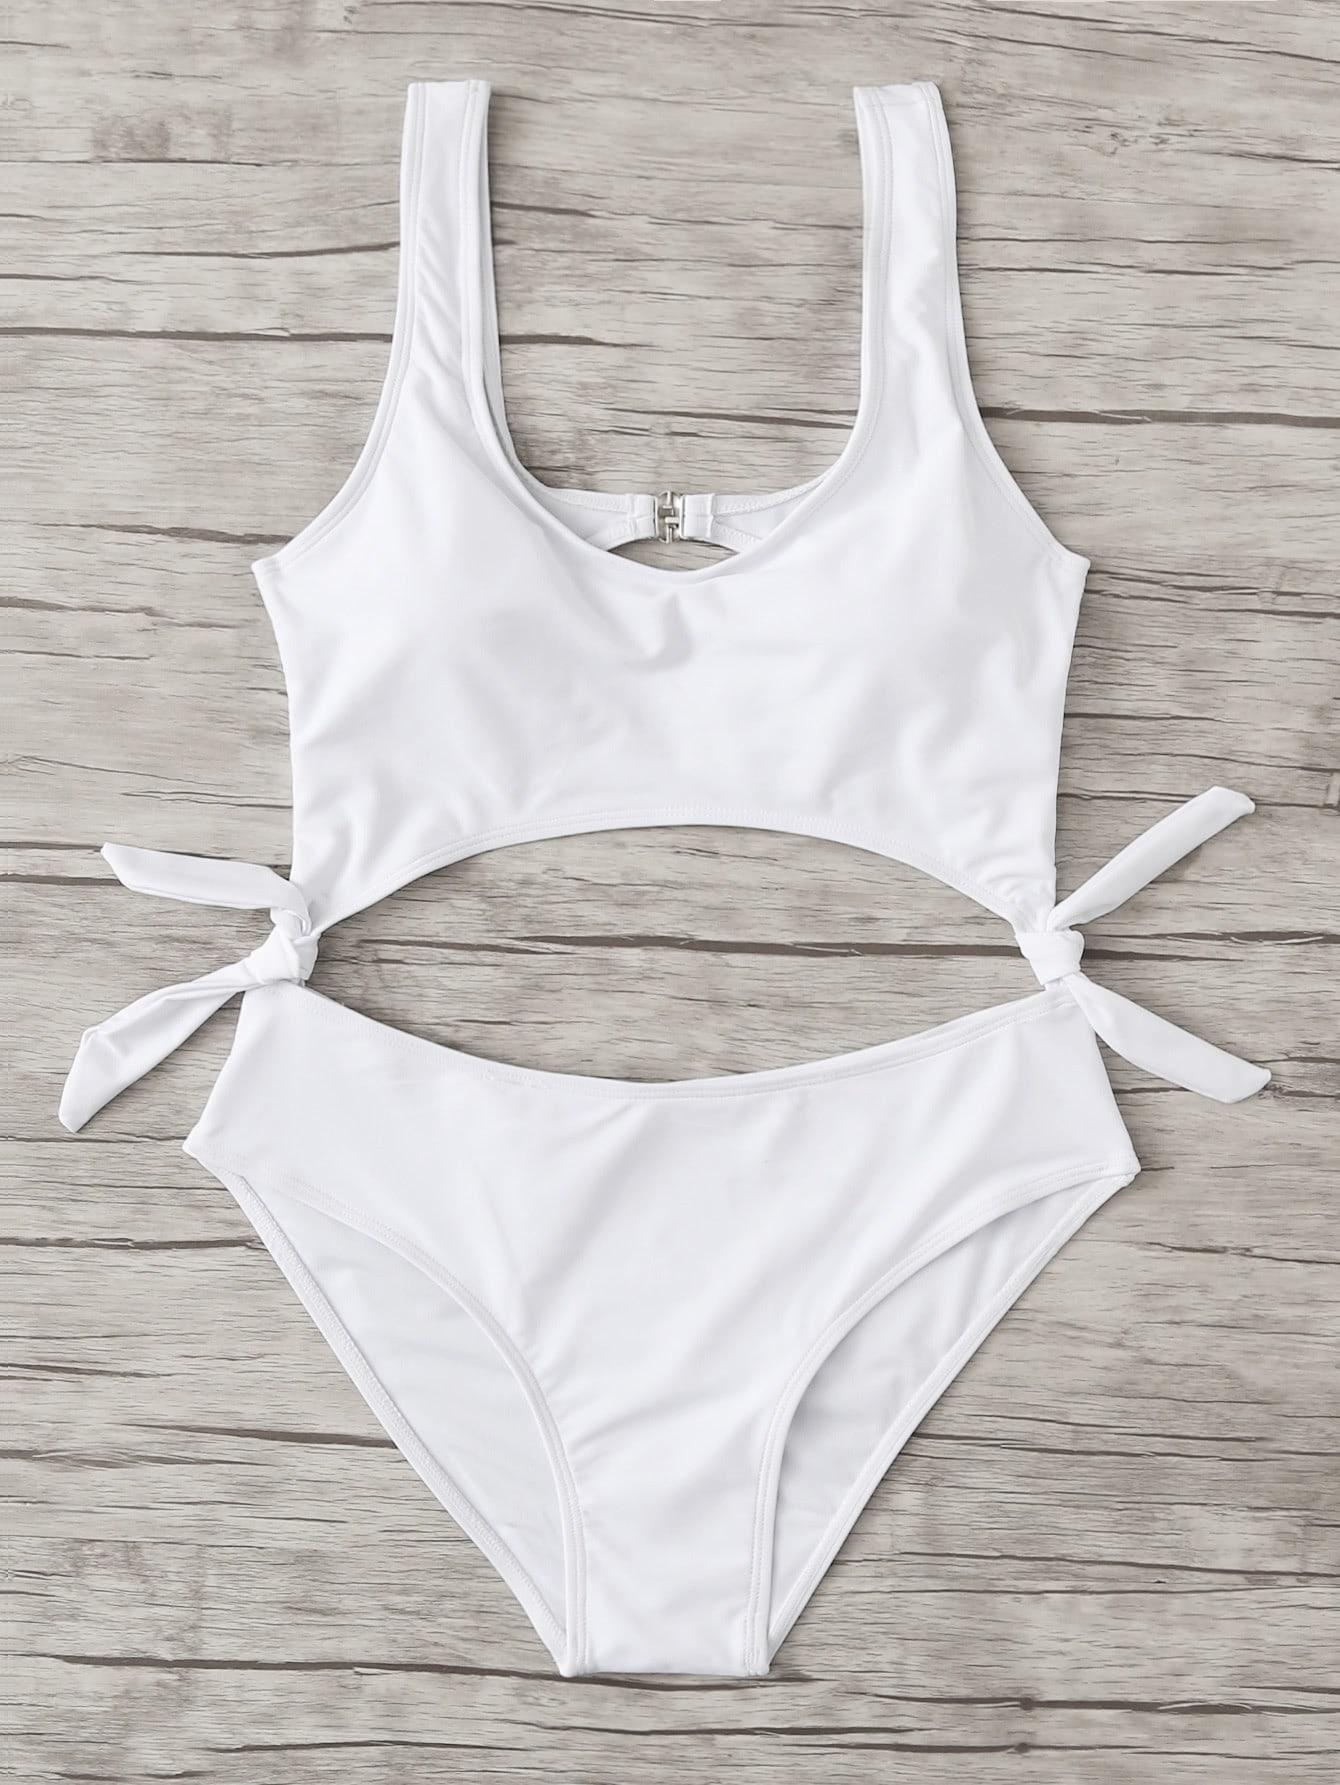 Knot Cut Out Swimsuit wrap knot swimsuit